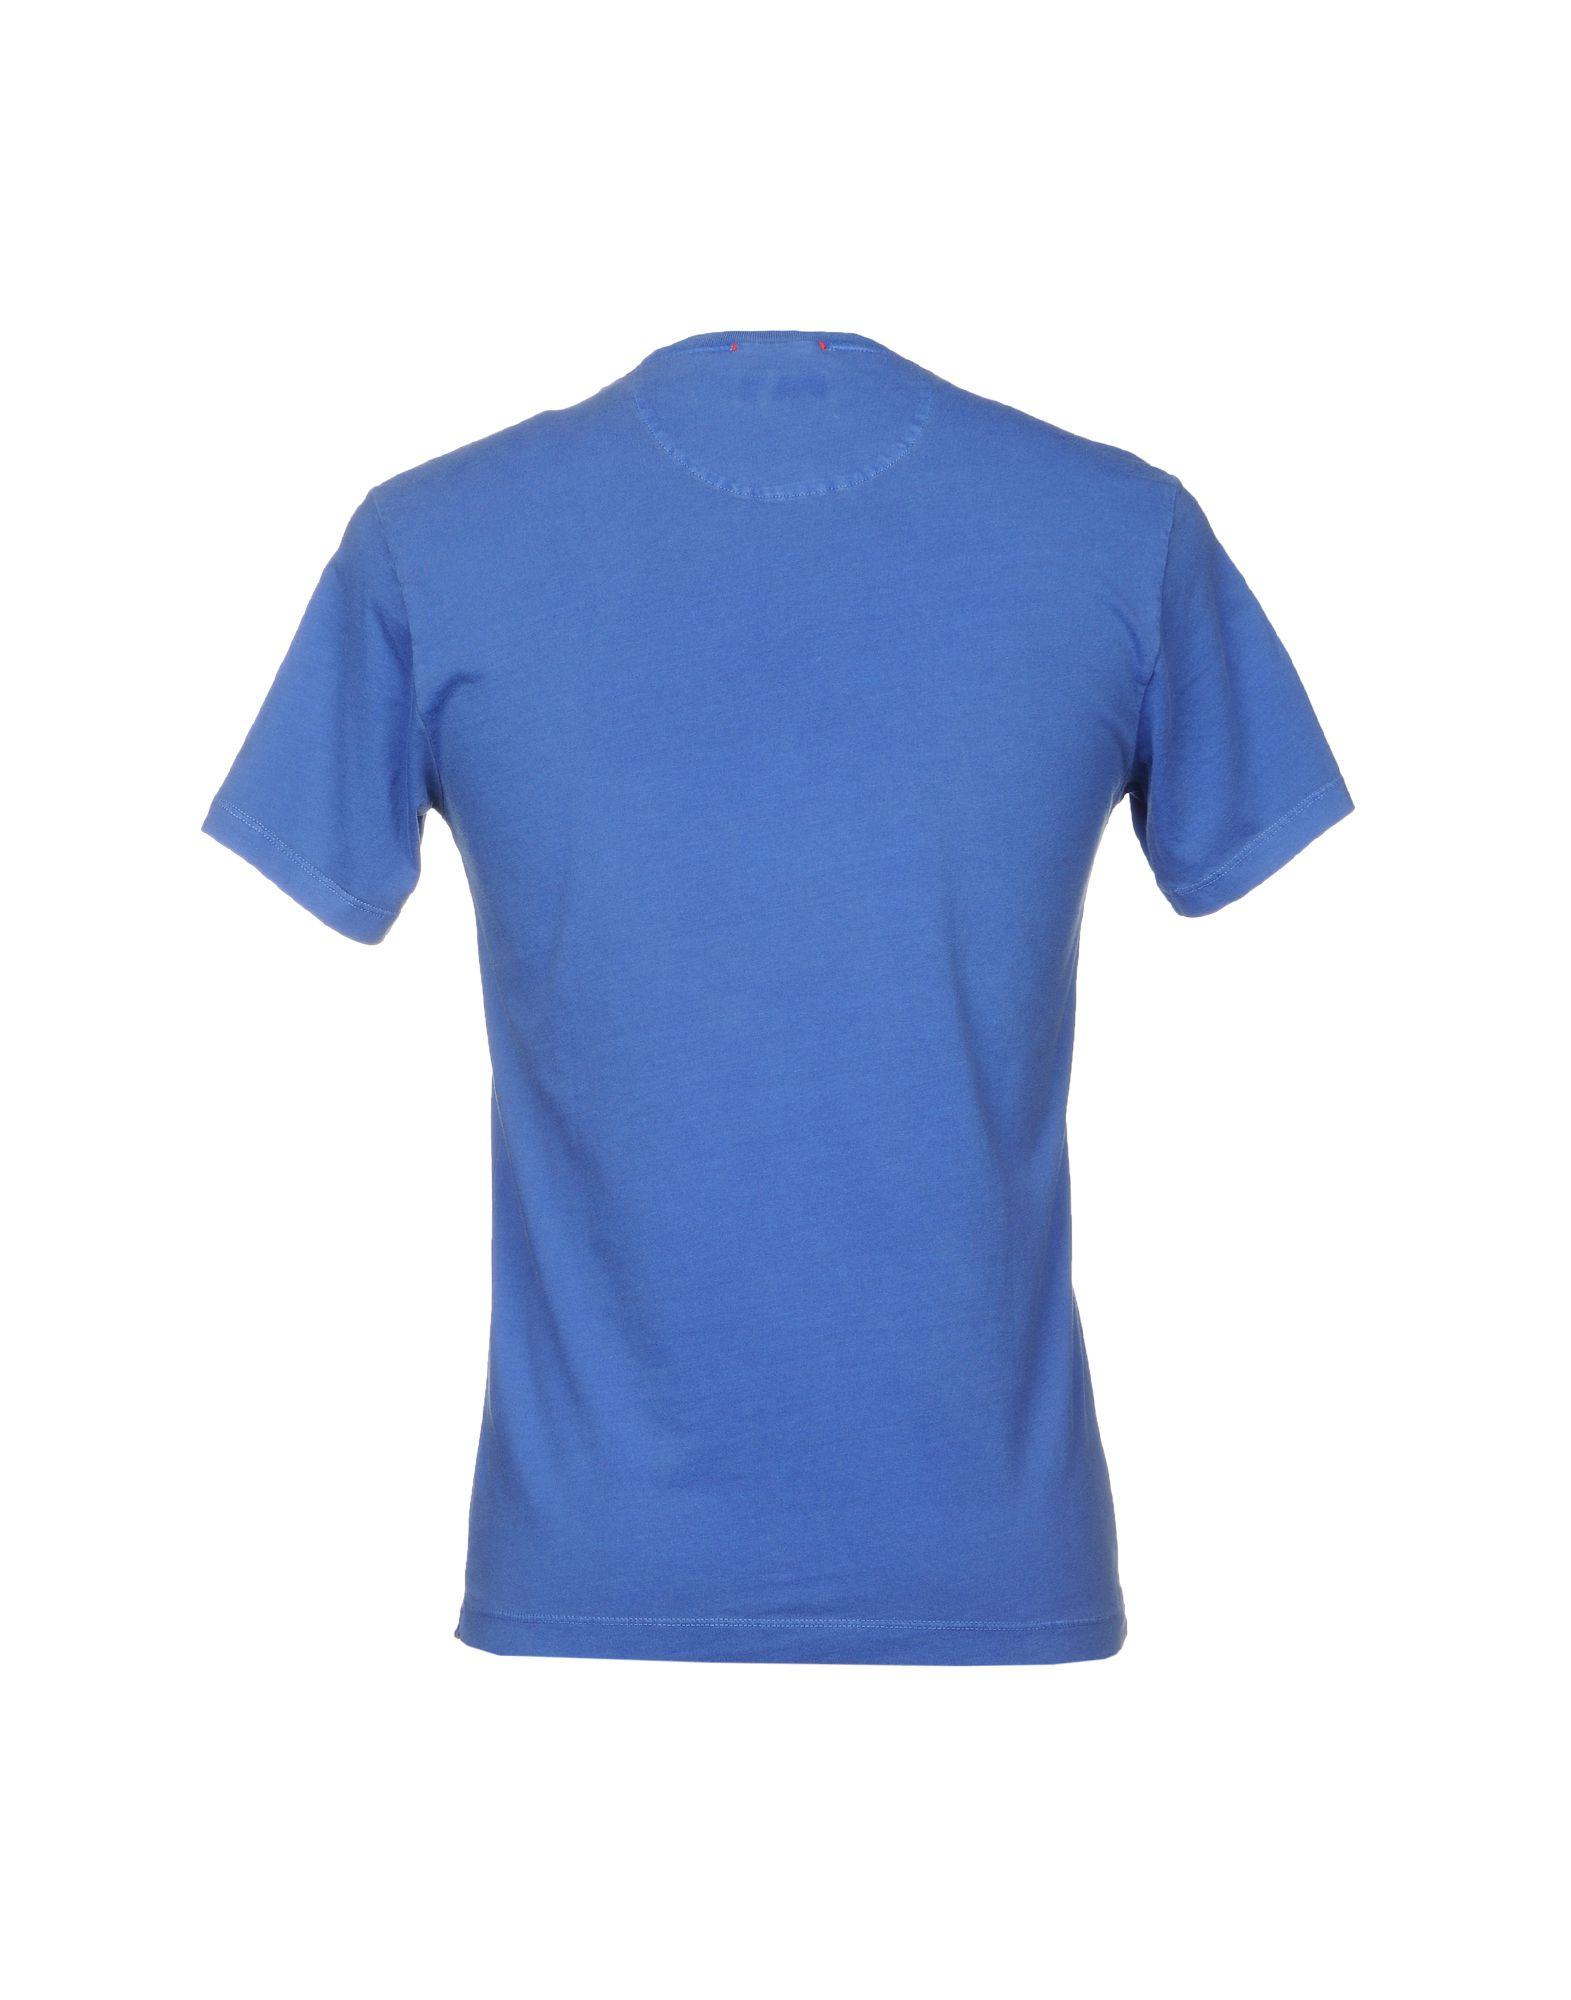 A buon mercato A buon mercato T-Shirt Woolrich Uomo 12115788WE - 12115788WE Uomo 22776b